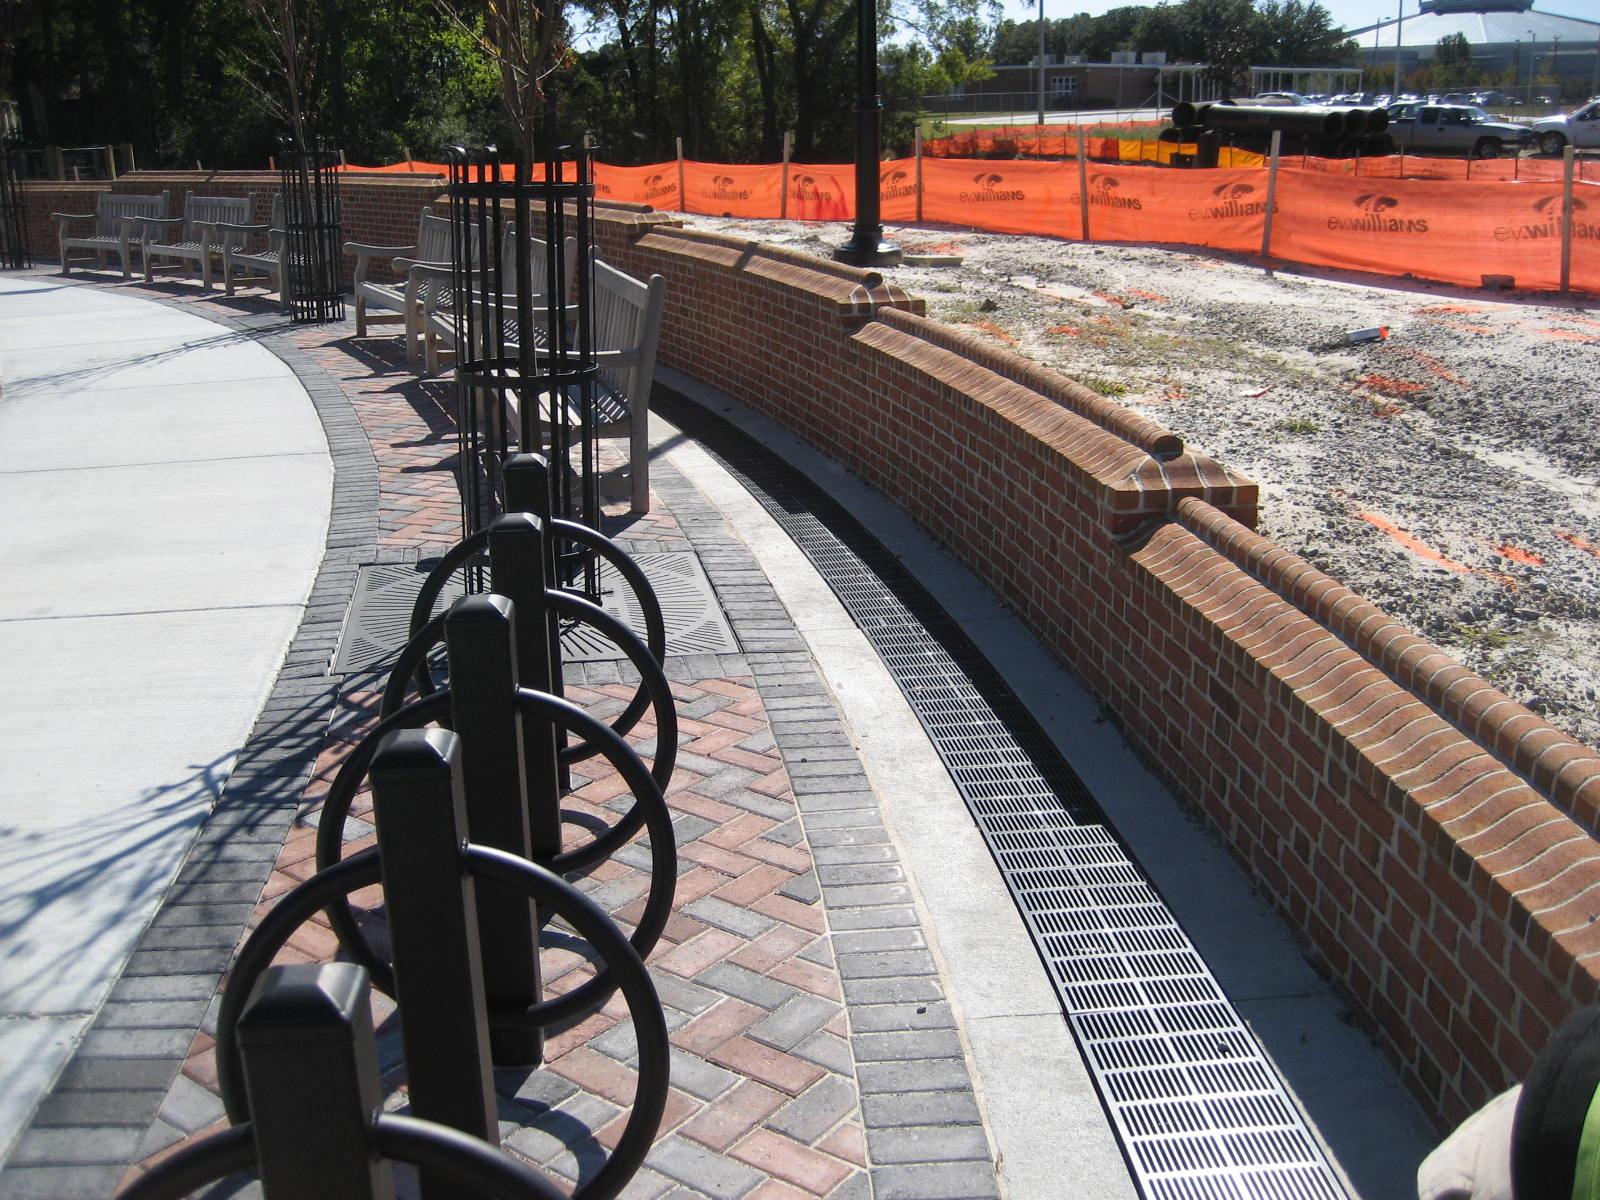 Park retaining wall